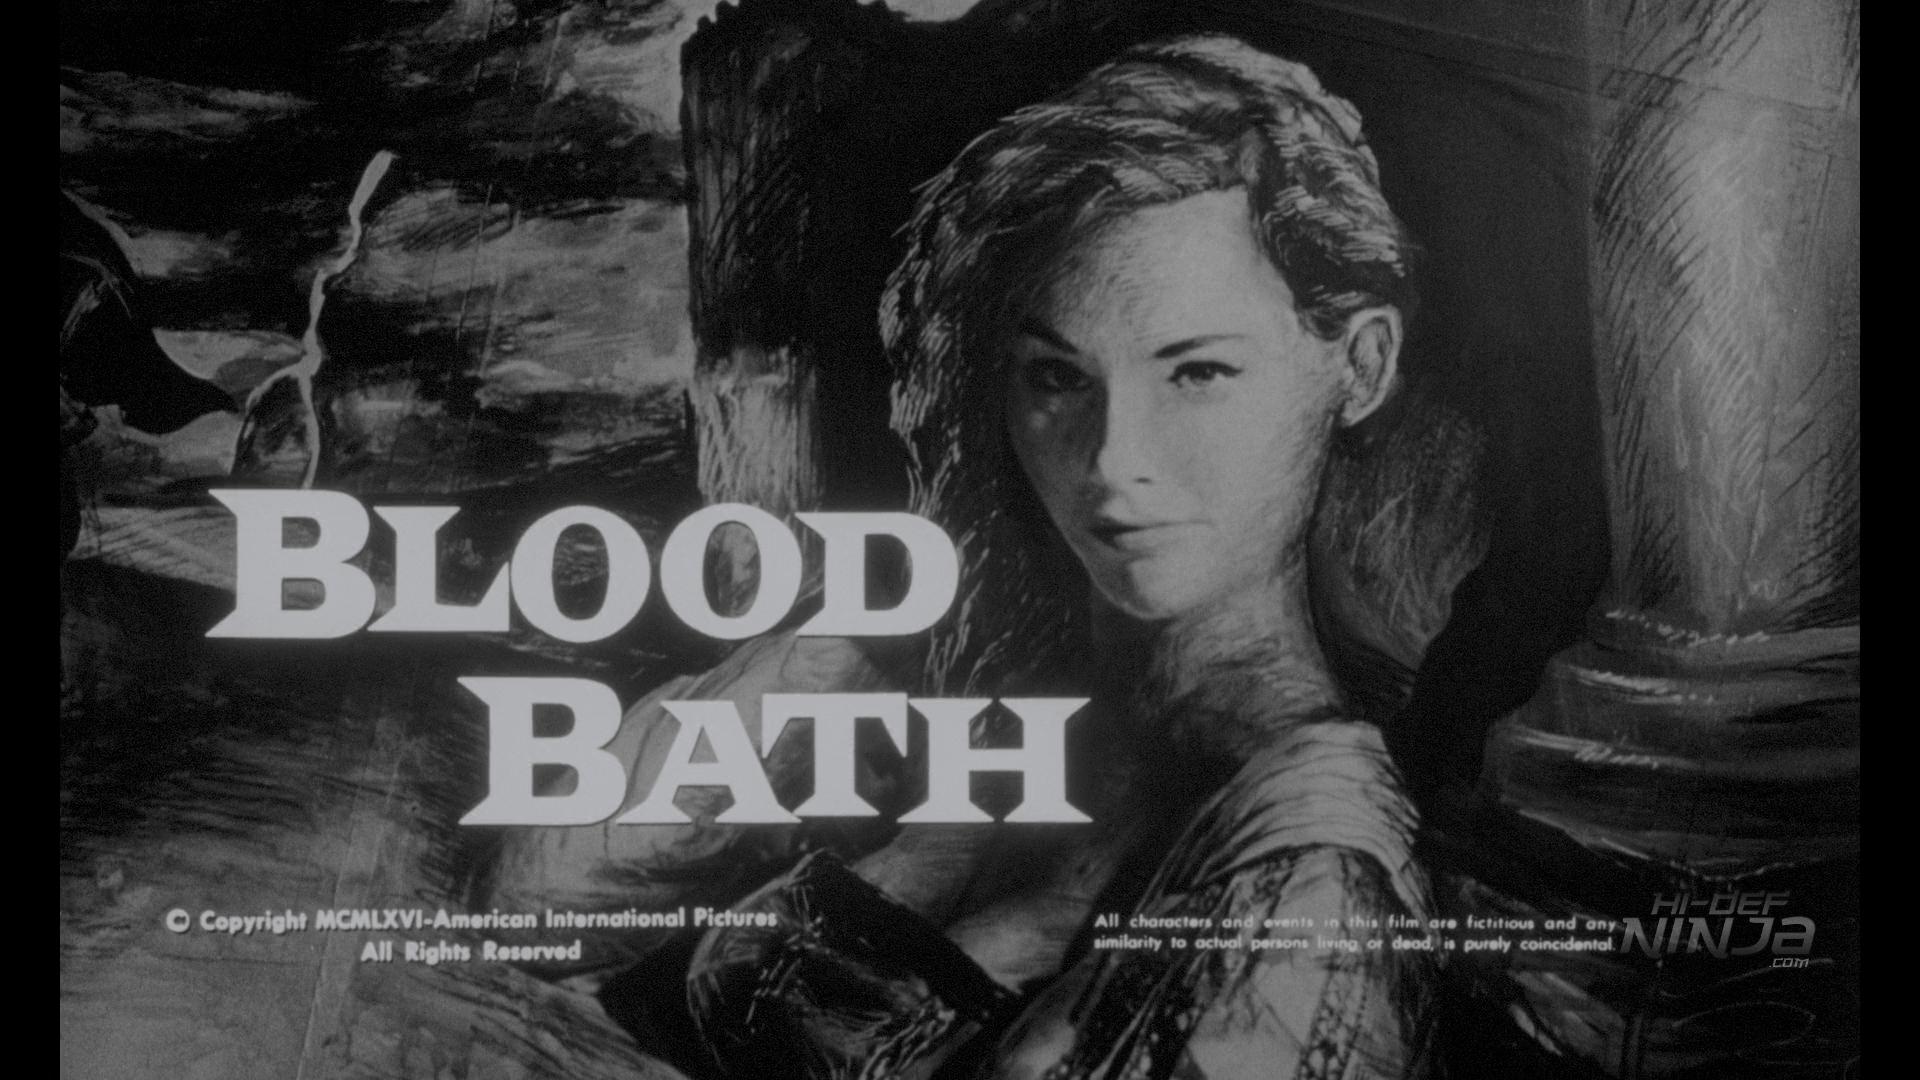 blood bath-review-2016-02